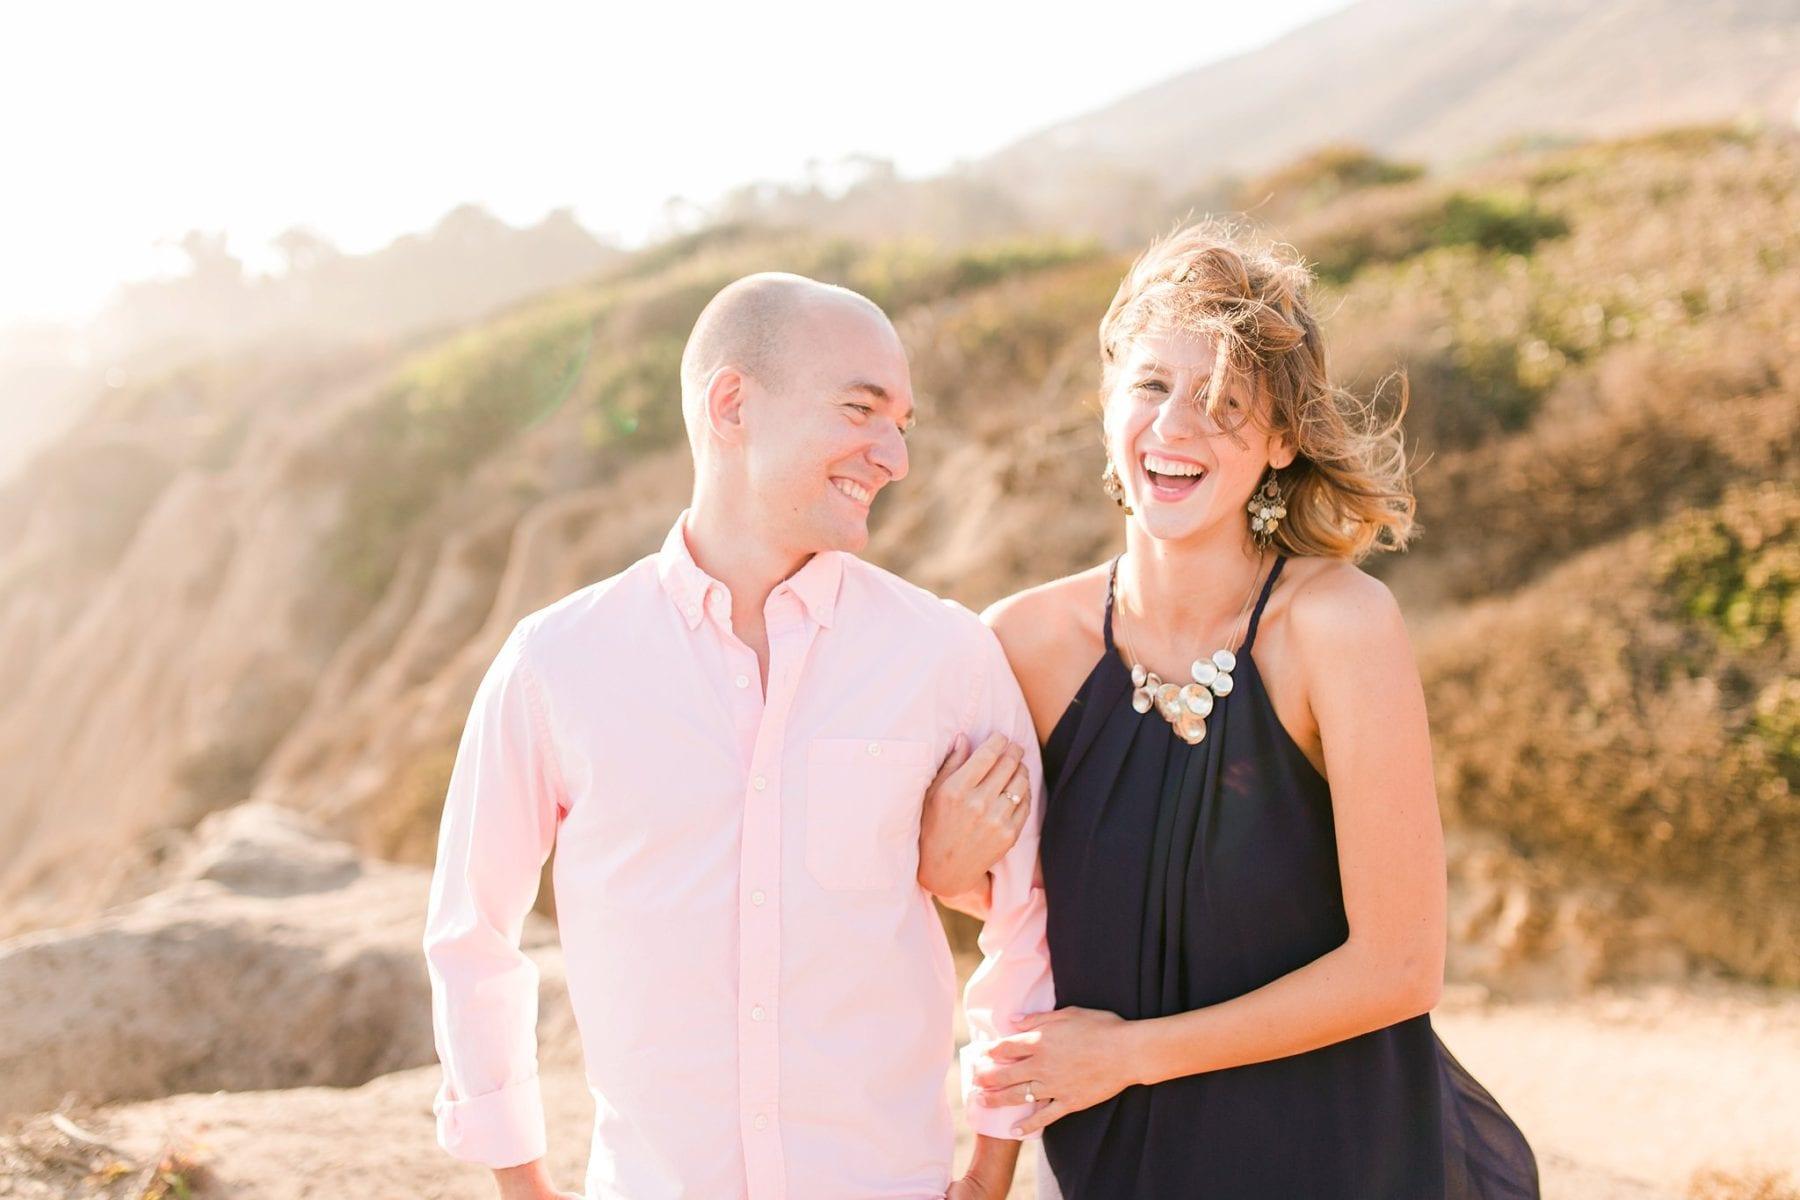 Malibu Engagement Photos California Wedding Photographer Megan Kelsey Photography Maria & David El Matador Beach -11.jpg